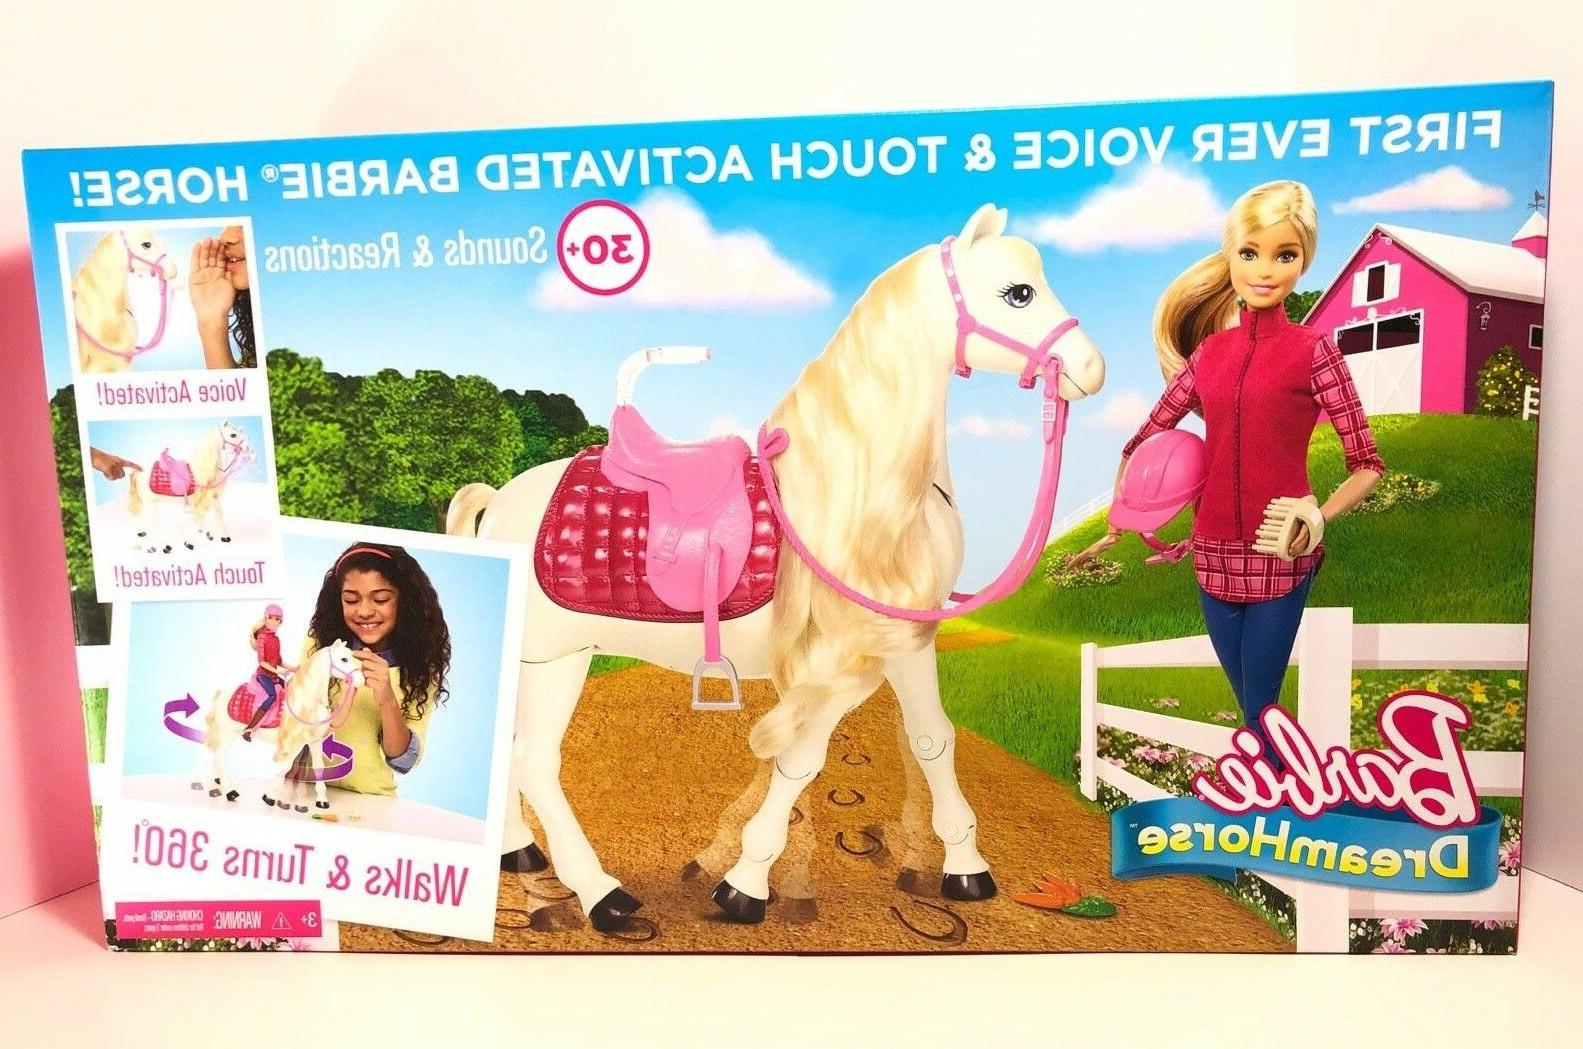 barbie dream horse and blonde barbie doll